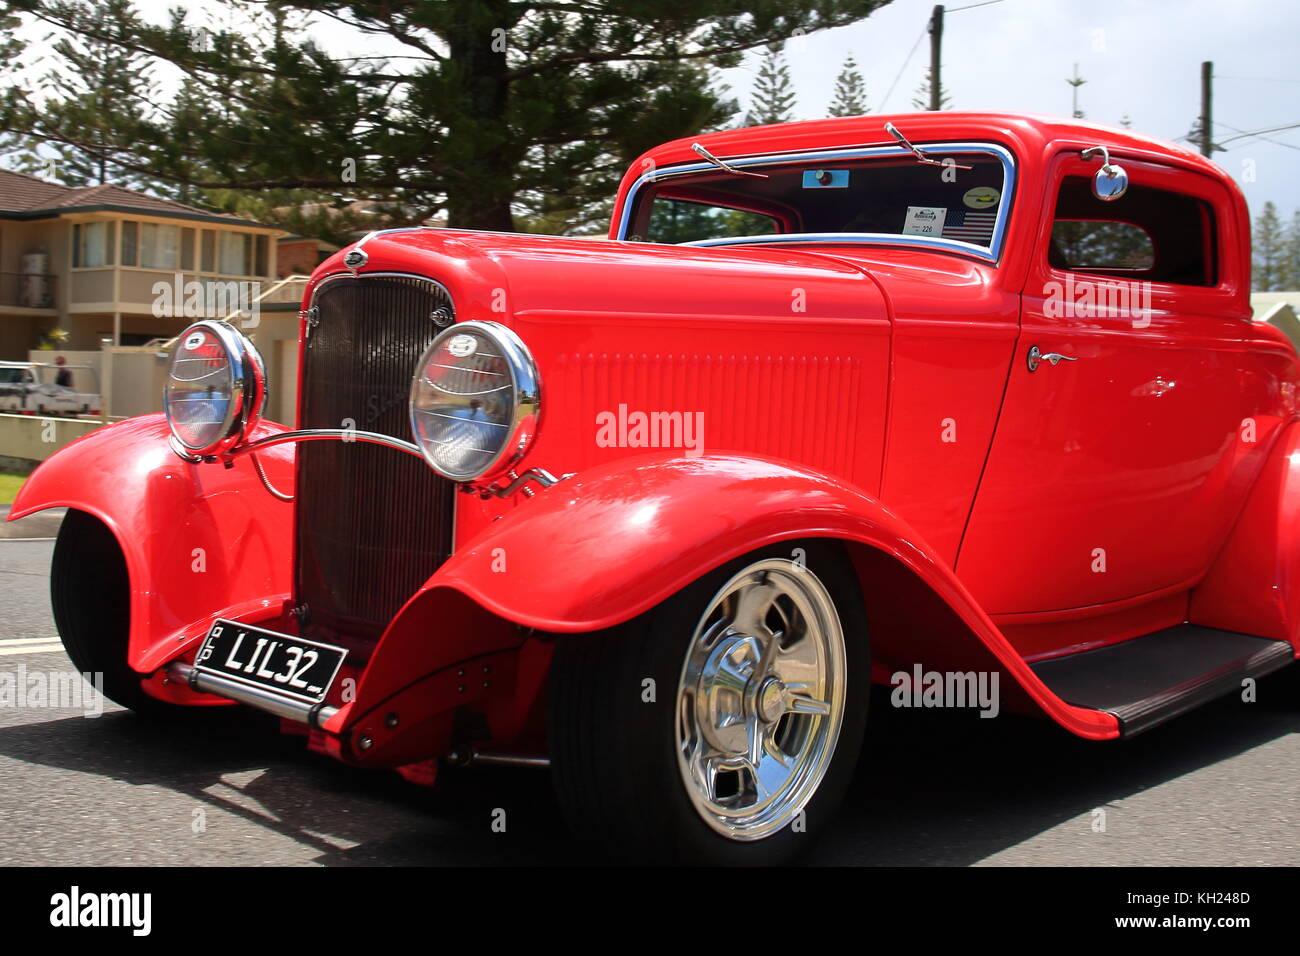 Vintage American Muscle Car Flame Stock Photos & Vintage American ...